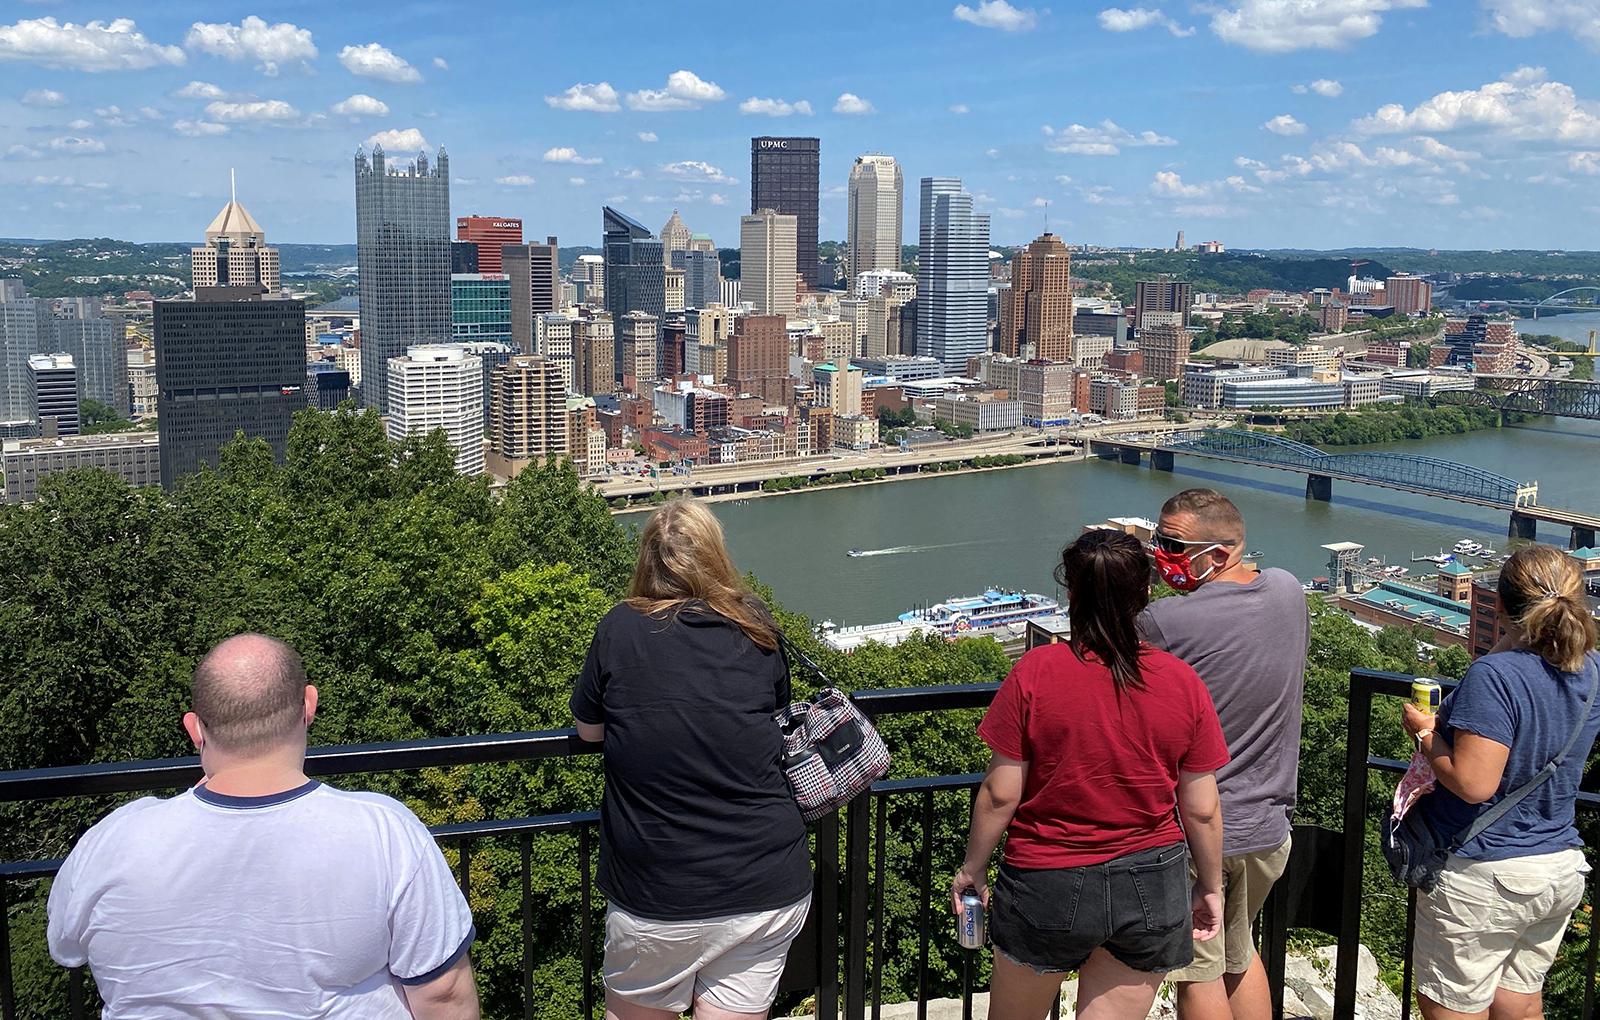 Tourists take photos of downtown Pittsburgh, Pennsylvania, on Saturday, July 25, amid the Coronavirus outbreak.